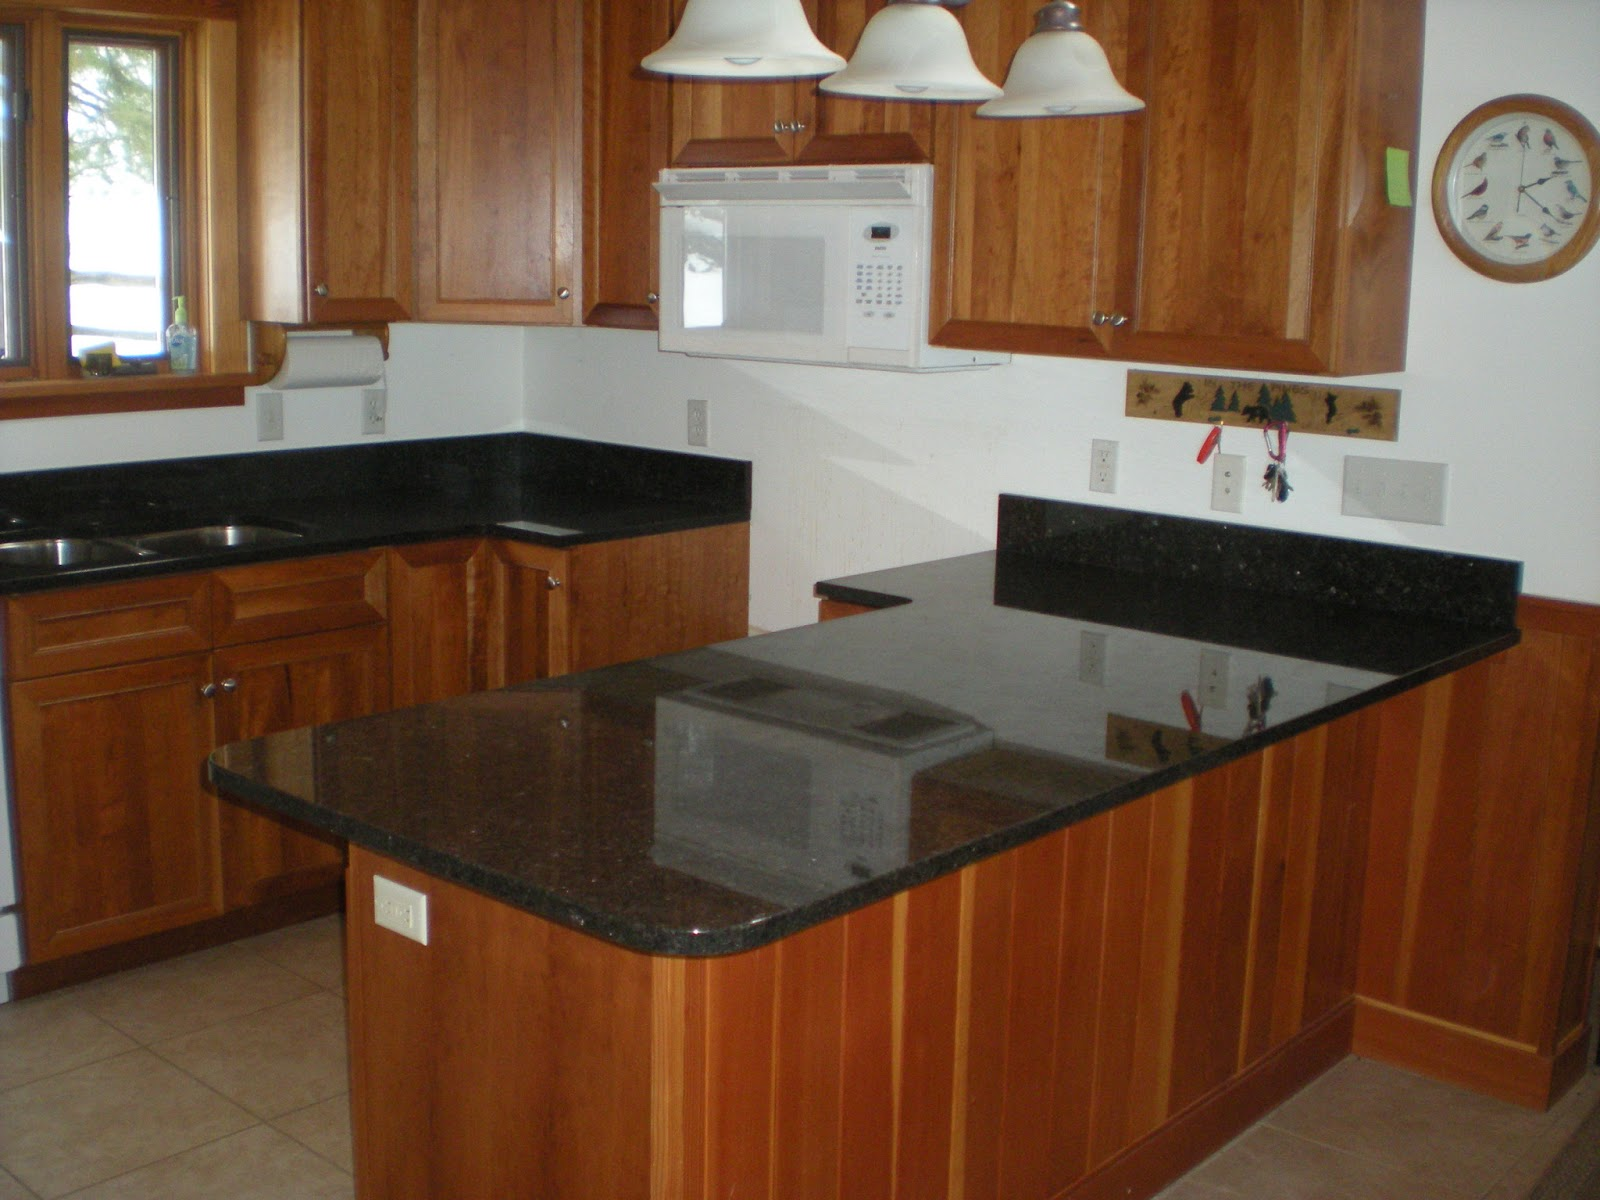 A Mesabi Black Granite countertop install - Huisman Concepts on Black Countertops  id=37551